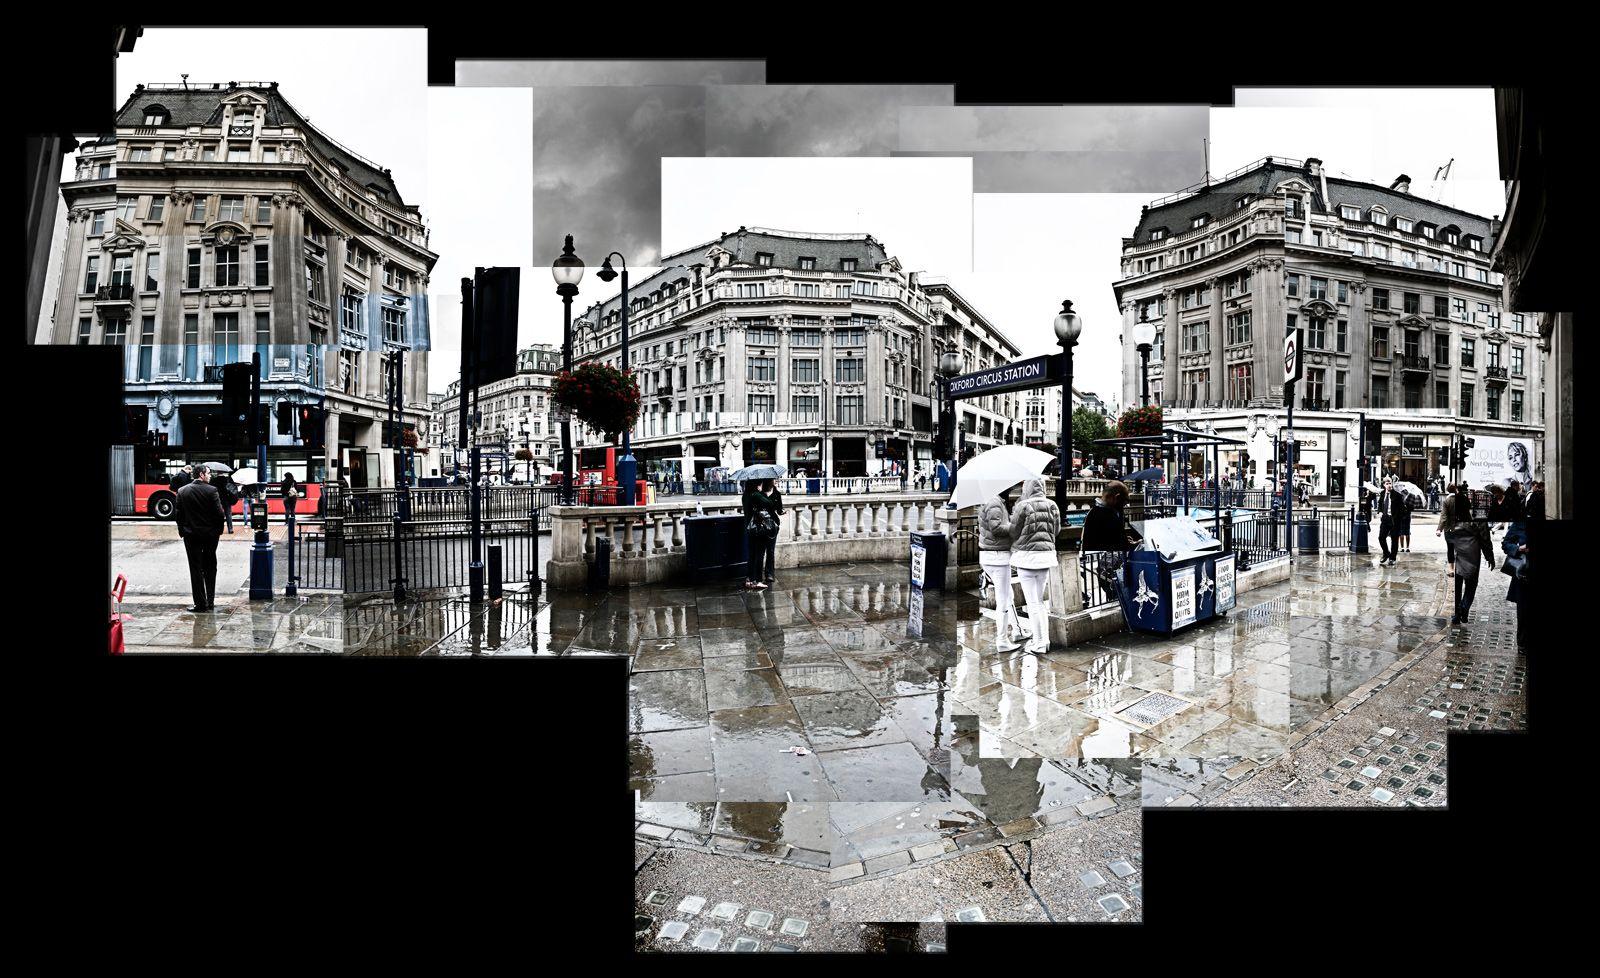 david hockney photo montage tutorial